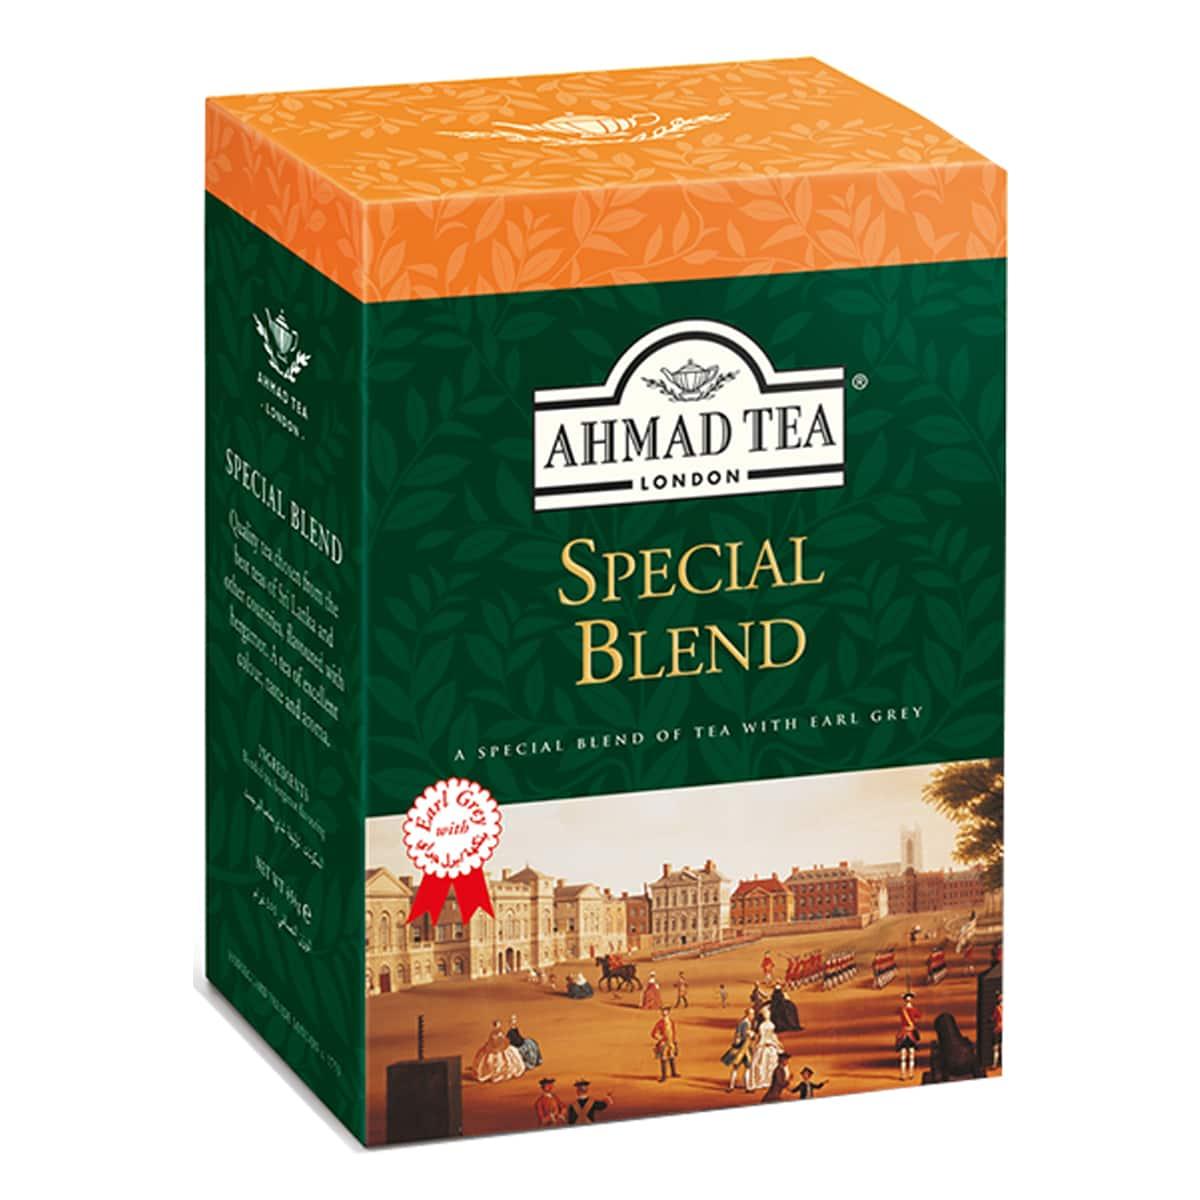 Buy Ahmad Tea London Special Blend with Earl Grey Tea (Loose Tea) - 500 gm